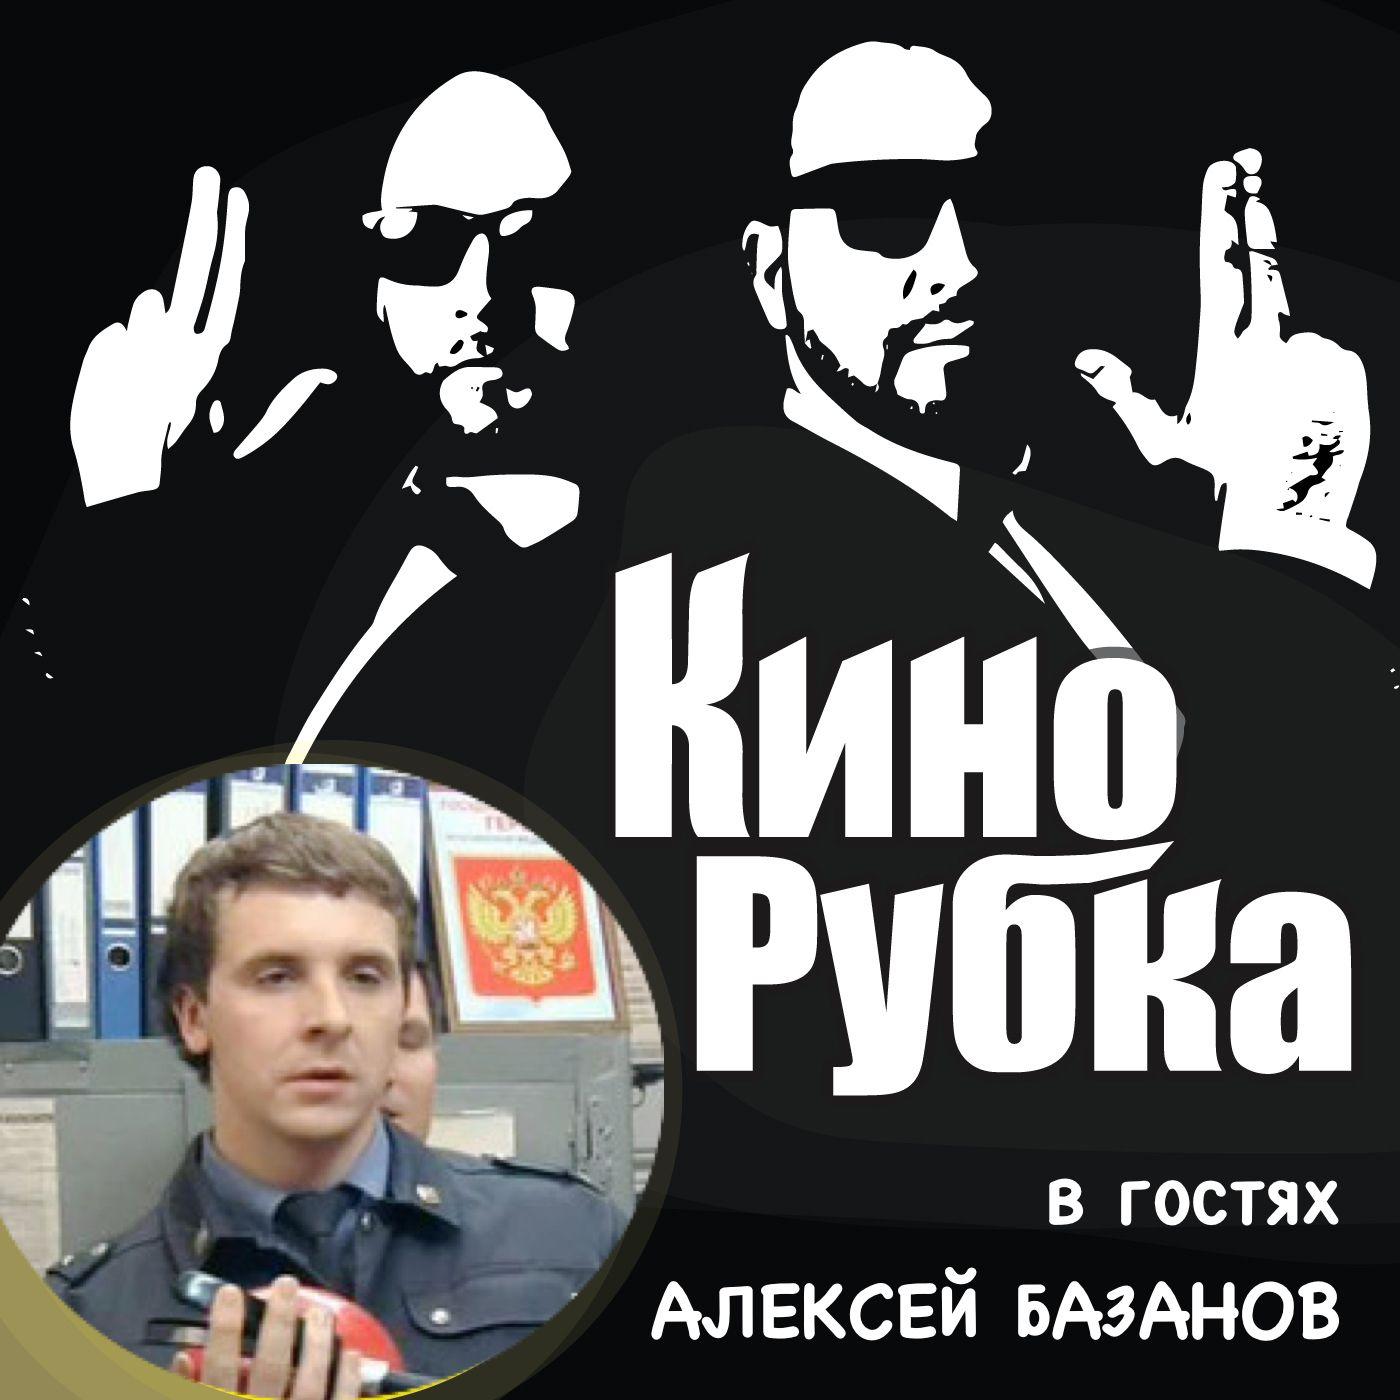 Павел Дикан Актер кино Алексей Базанов павел дикан актер театра и кино николай цонку